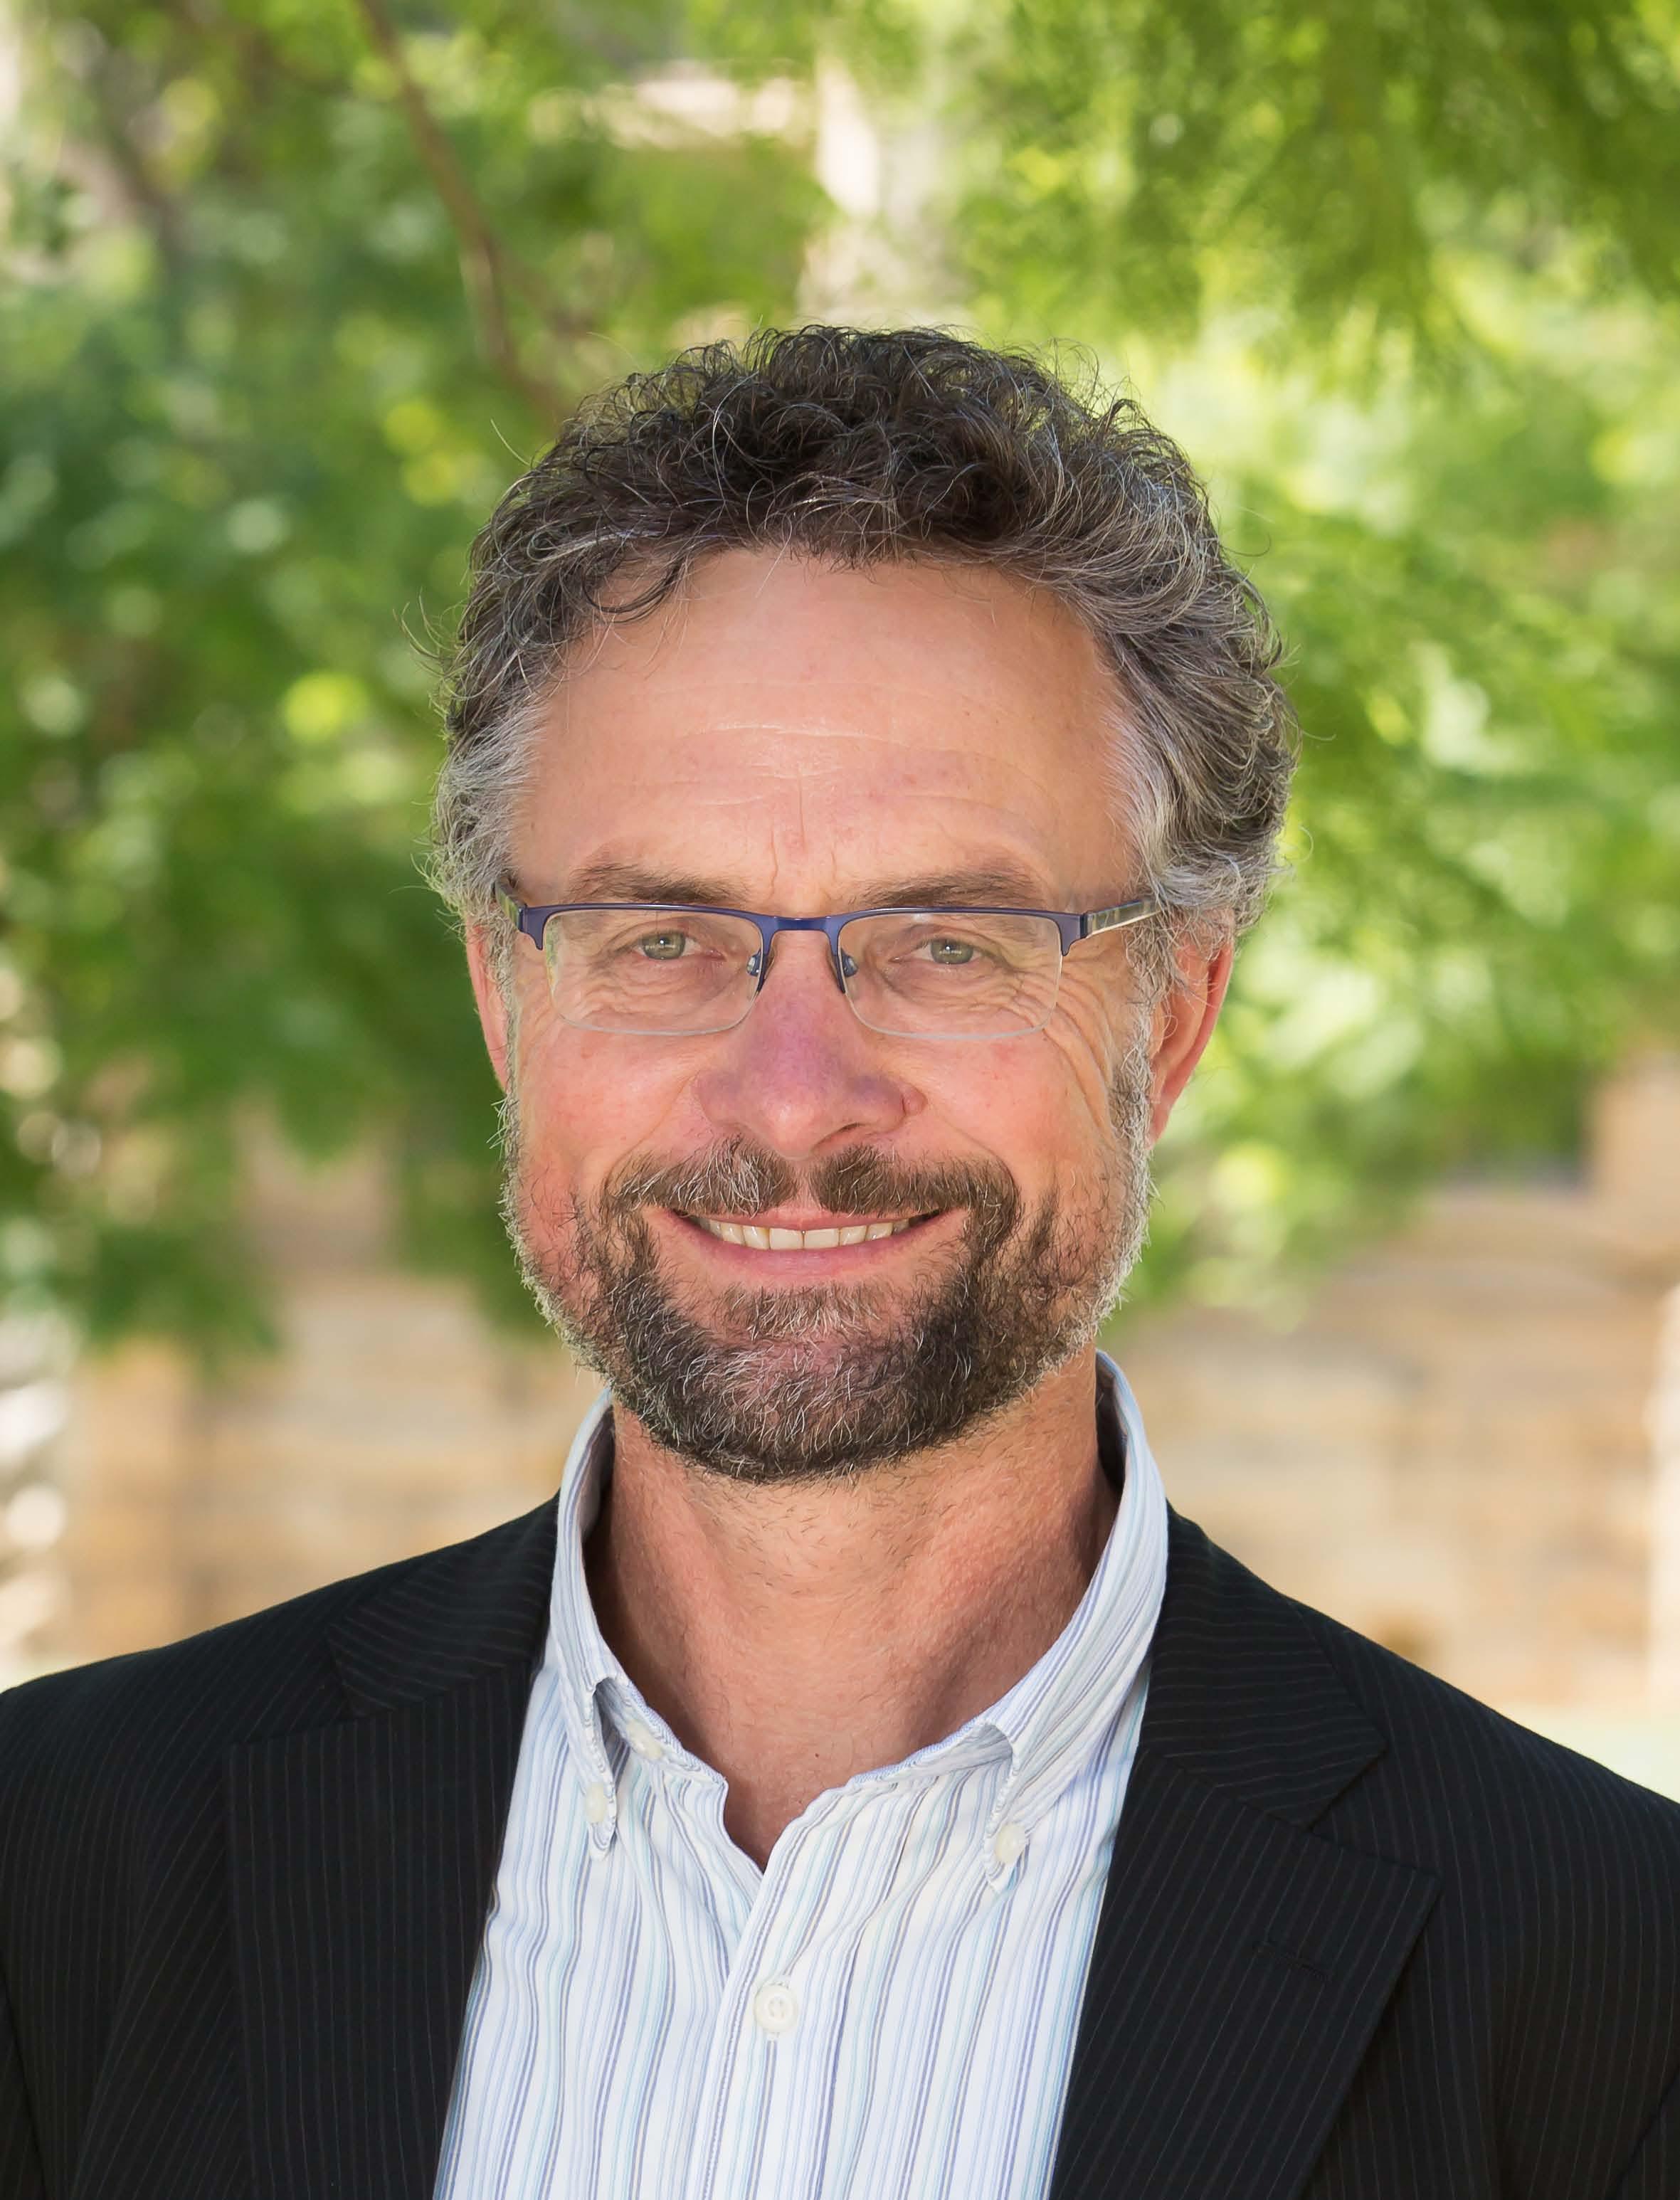 Professor Jozef Gecz